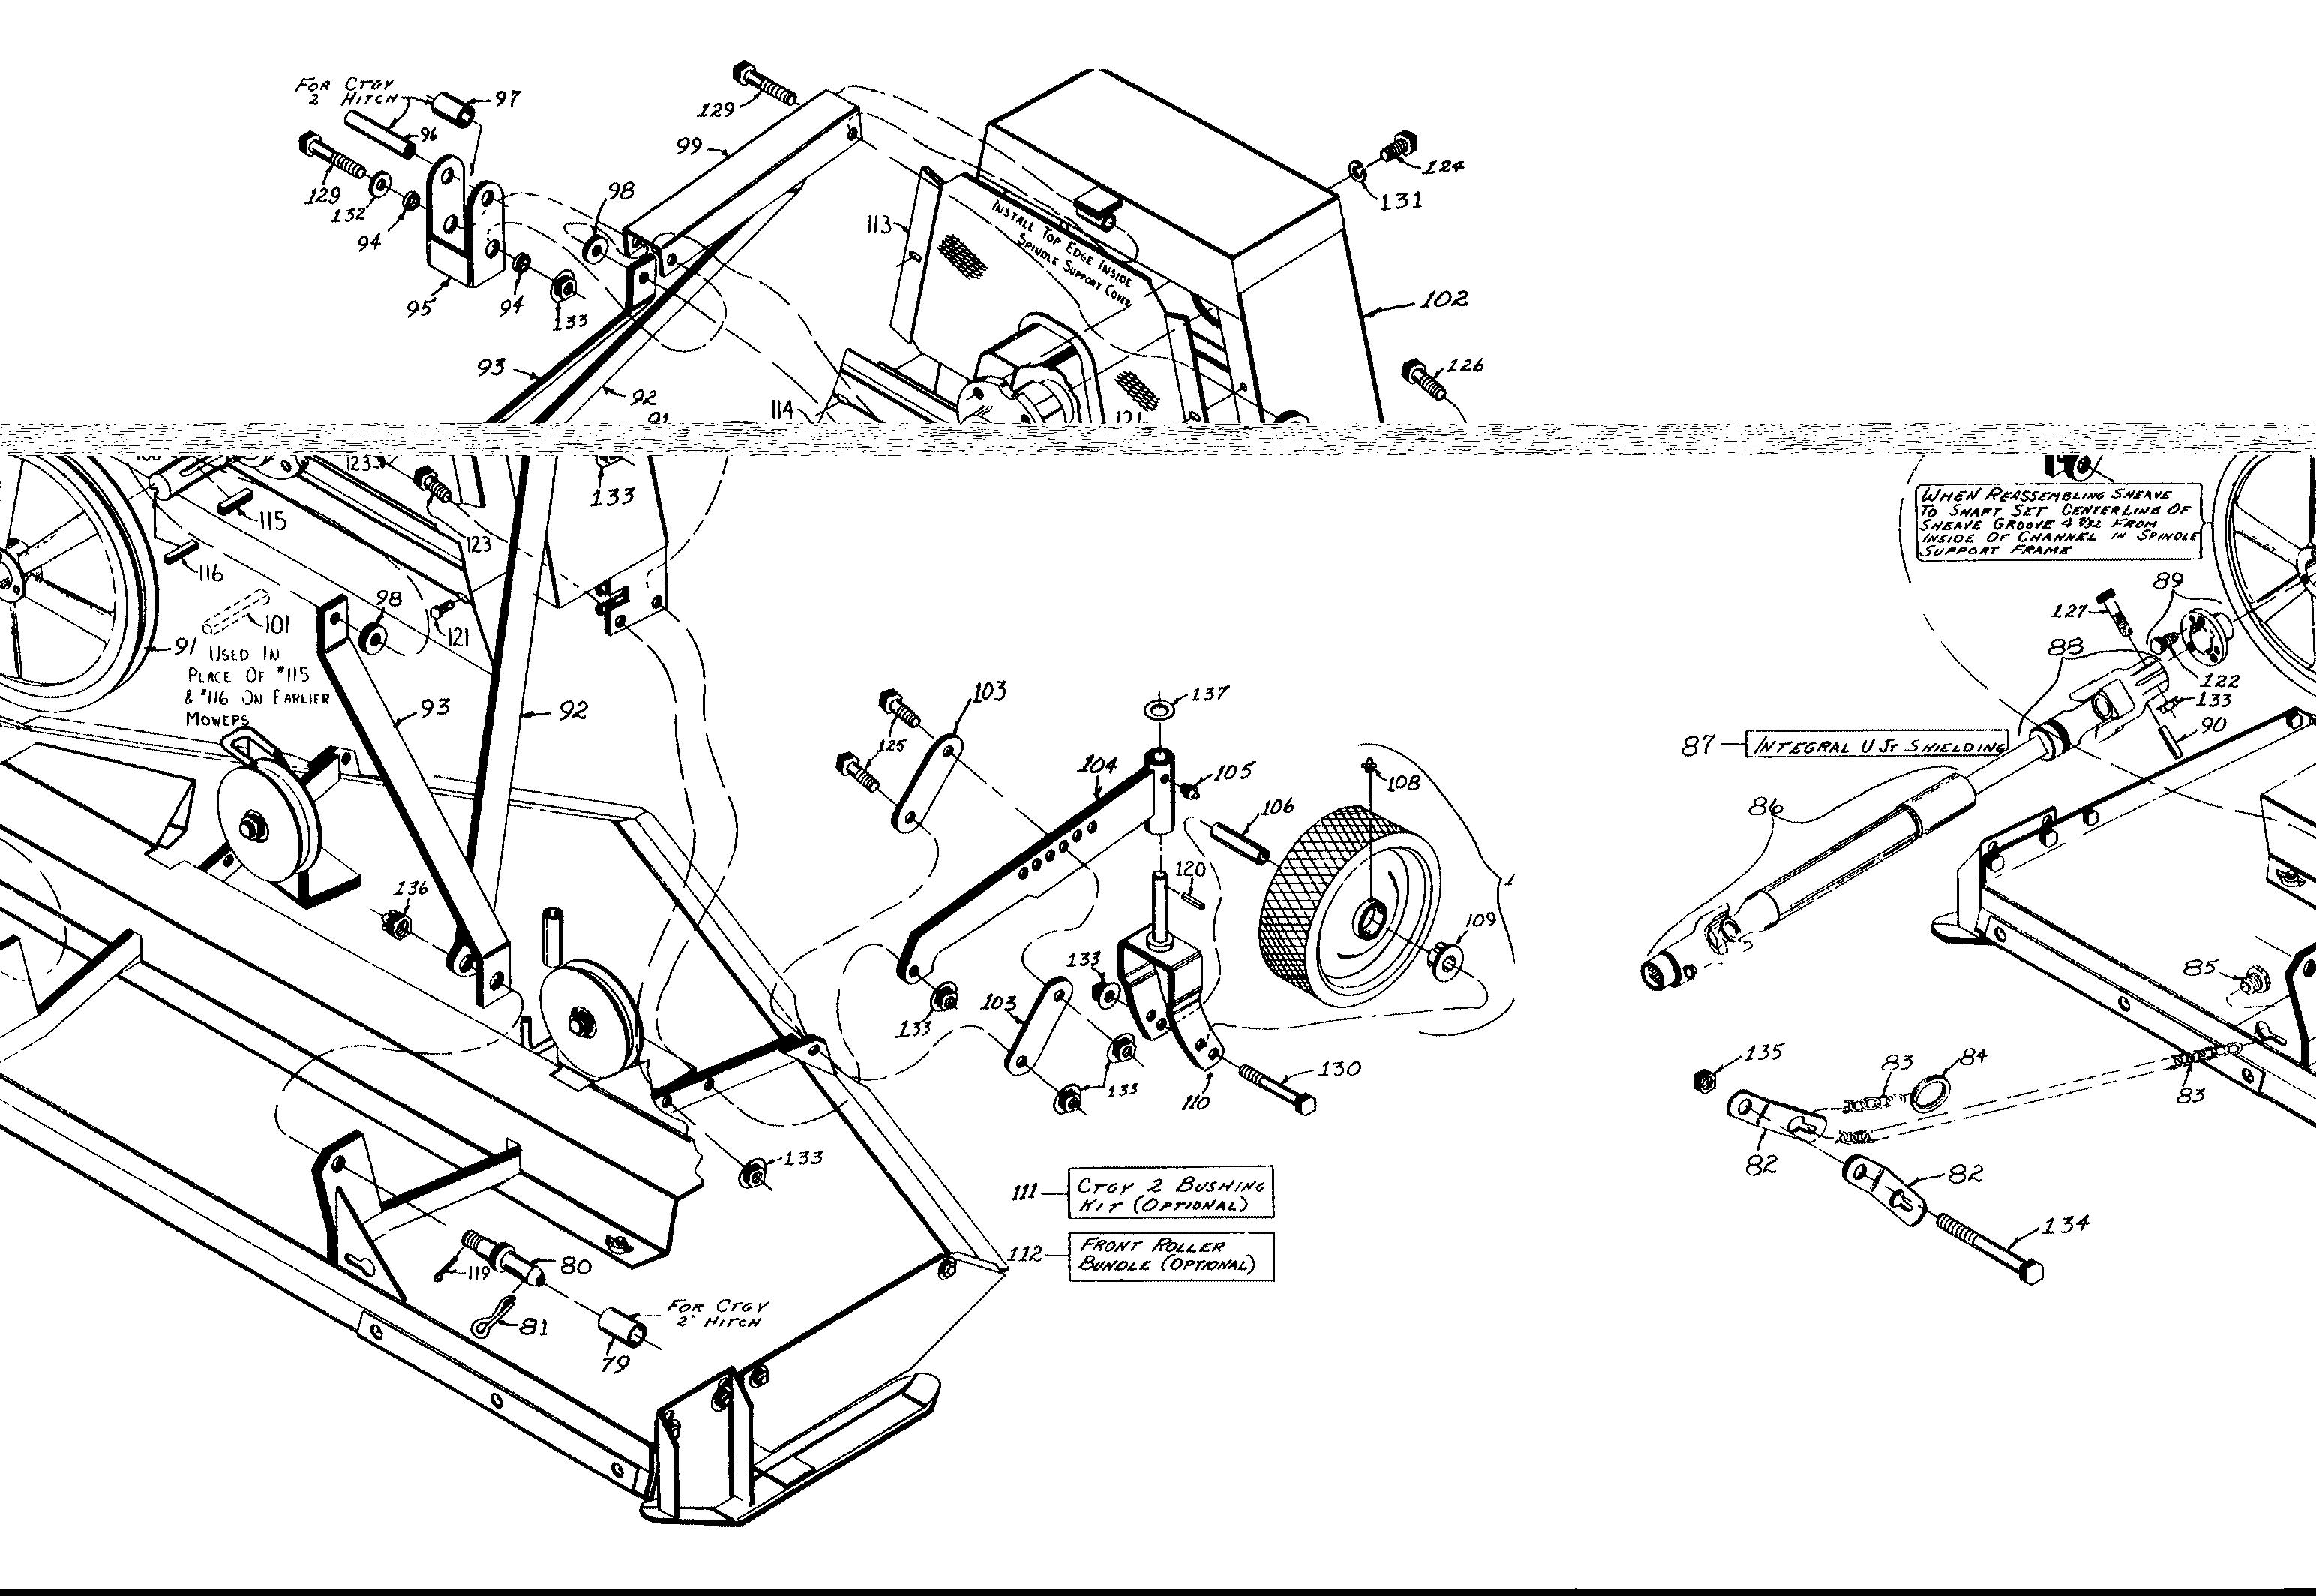 Woods Mower Parts Diagrams Woods Parts 1001 Best Wood Inspiration Ideas Images Building